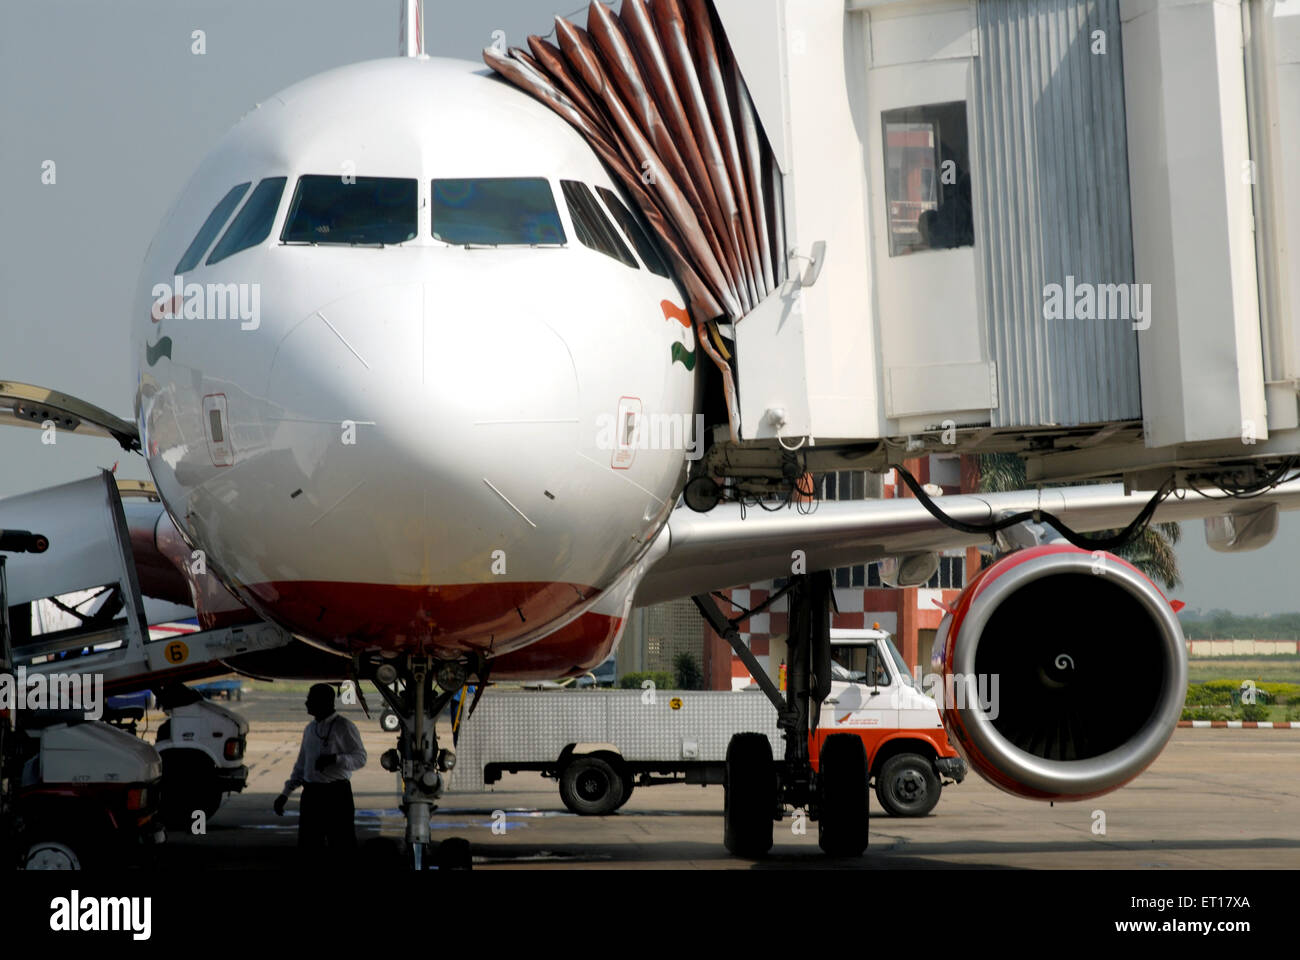 Aeroplane loading luggage at airport ; India No MR - Stock Image